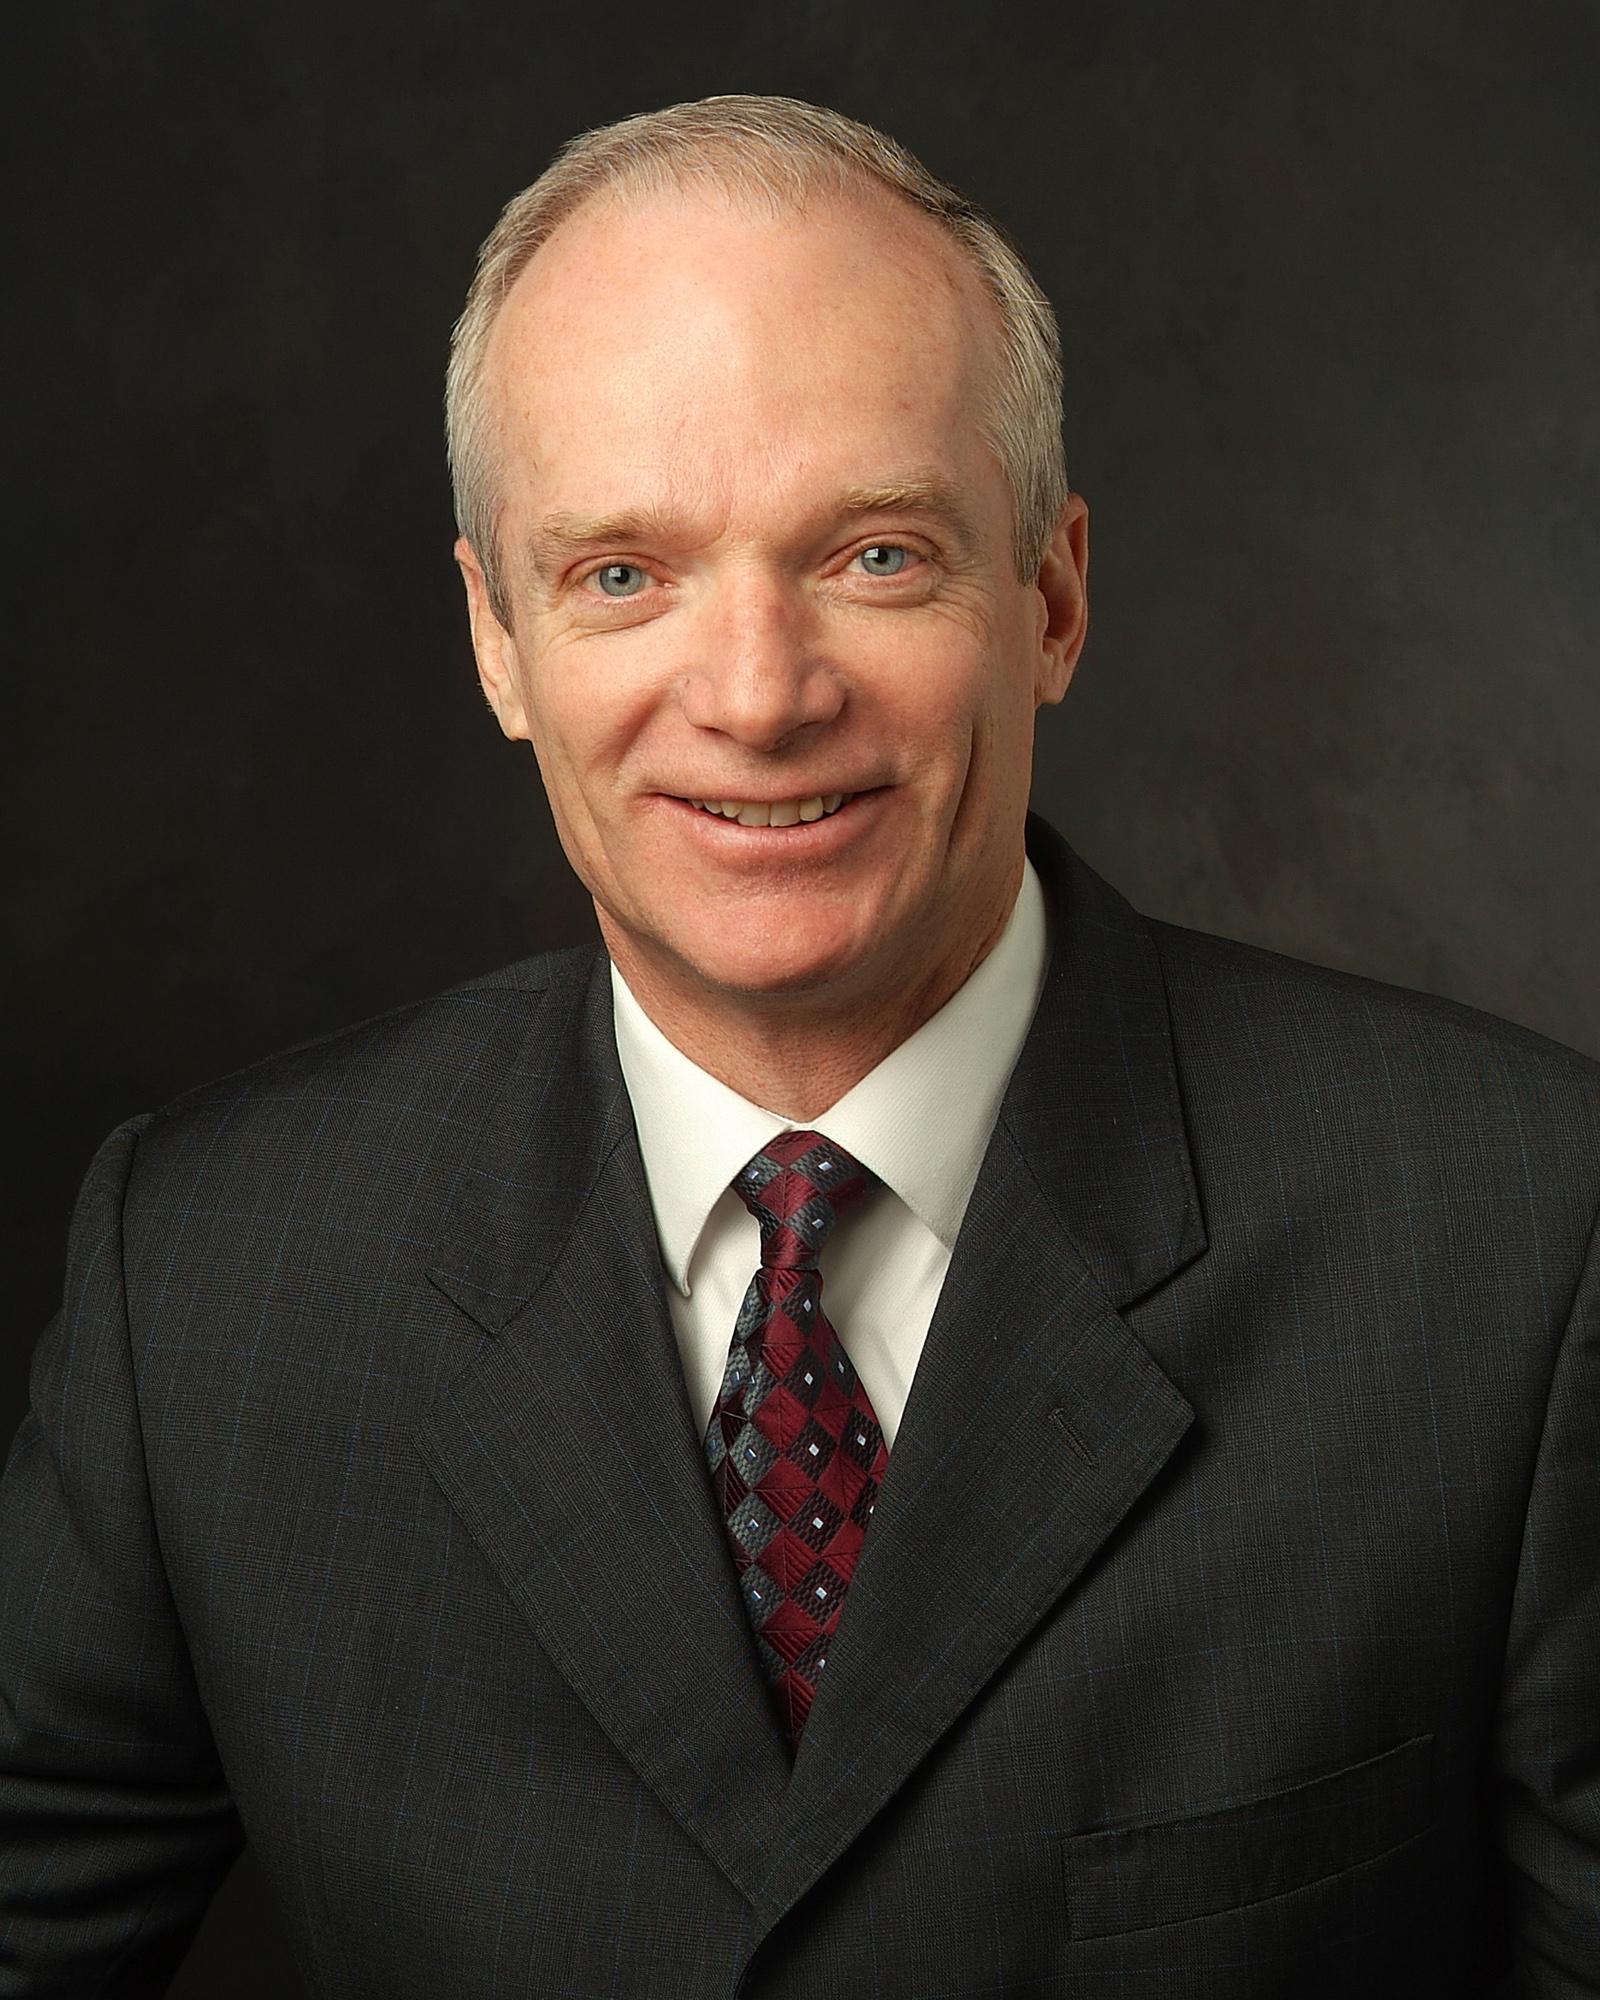 Charles J. Precourt headshot